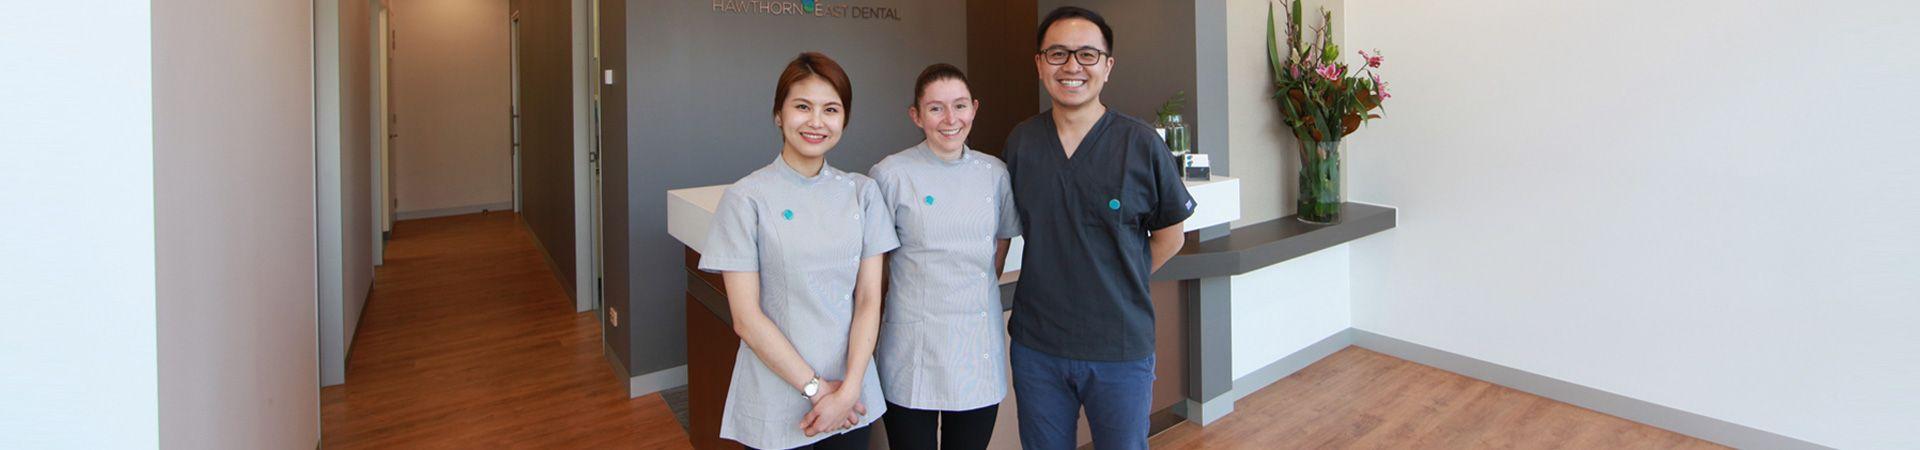 Dental Implants Melbourne, Hawthorn east   Teeth dentist ...